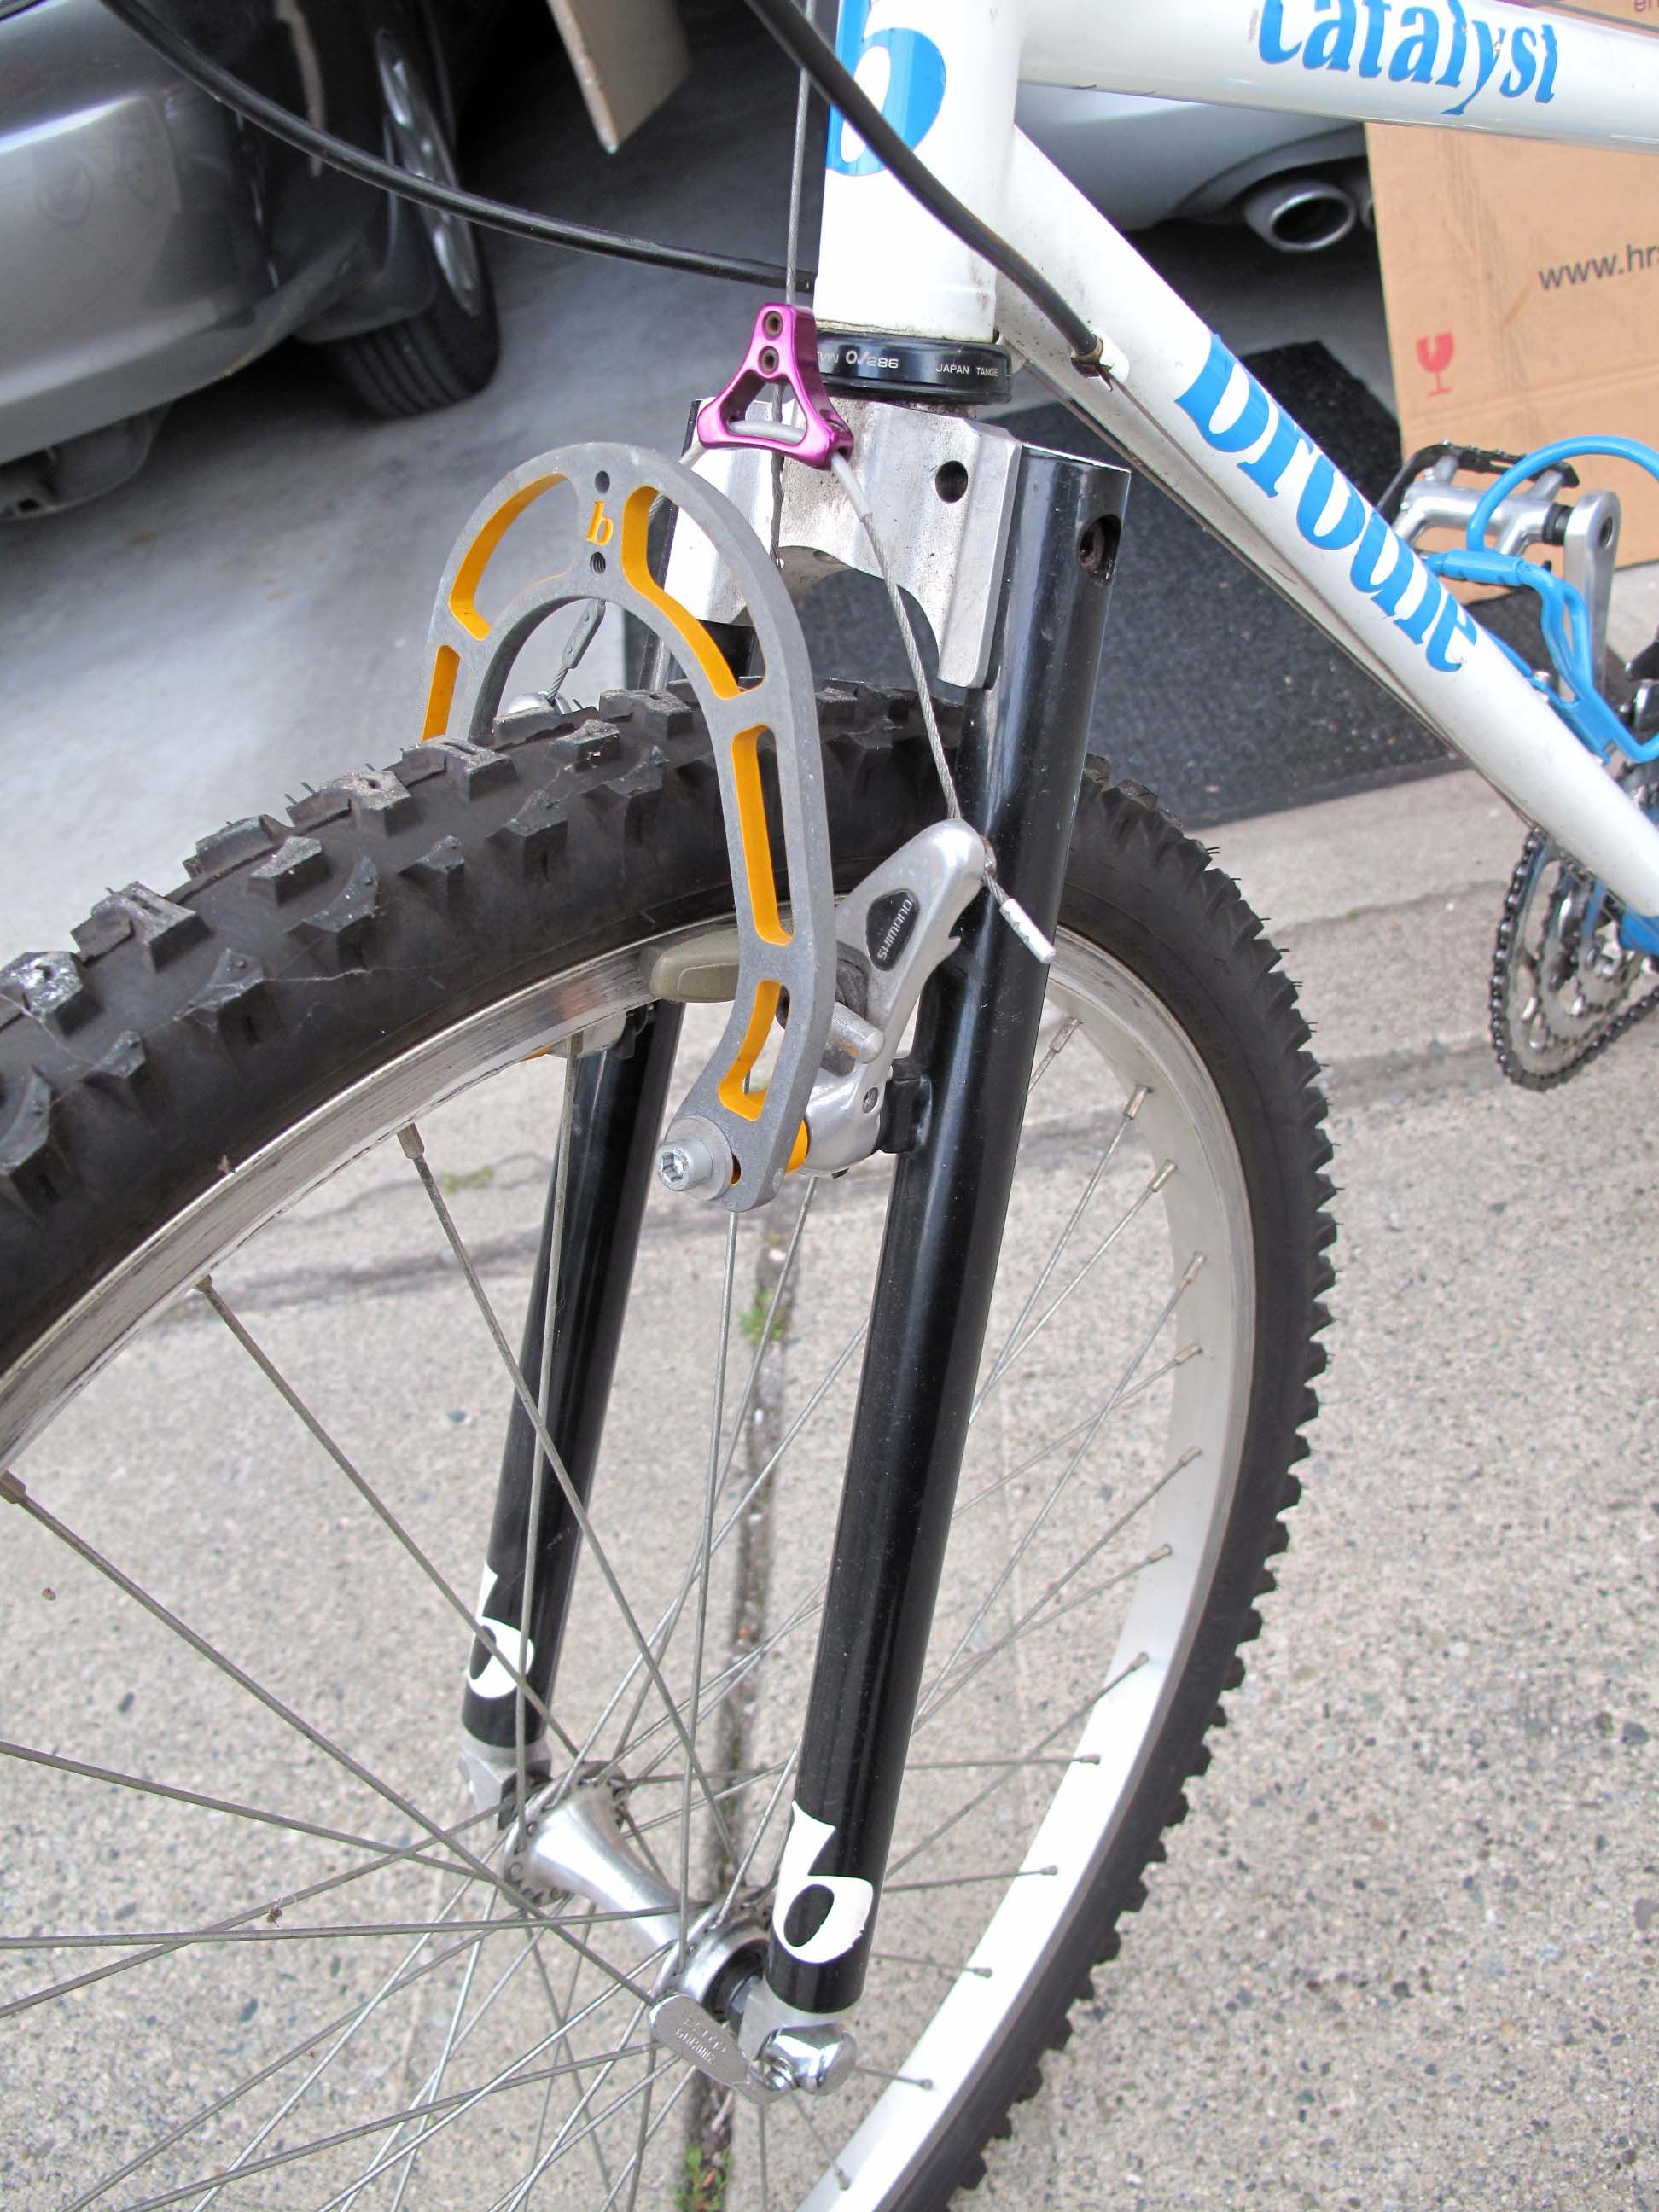 1993 Brodie Rigid Fork Retro Bike Cool Bikes Vintage Bikes